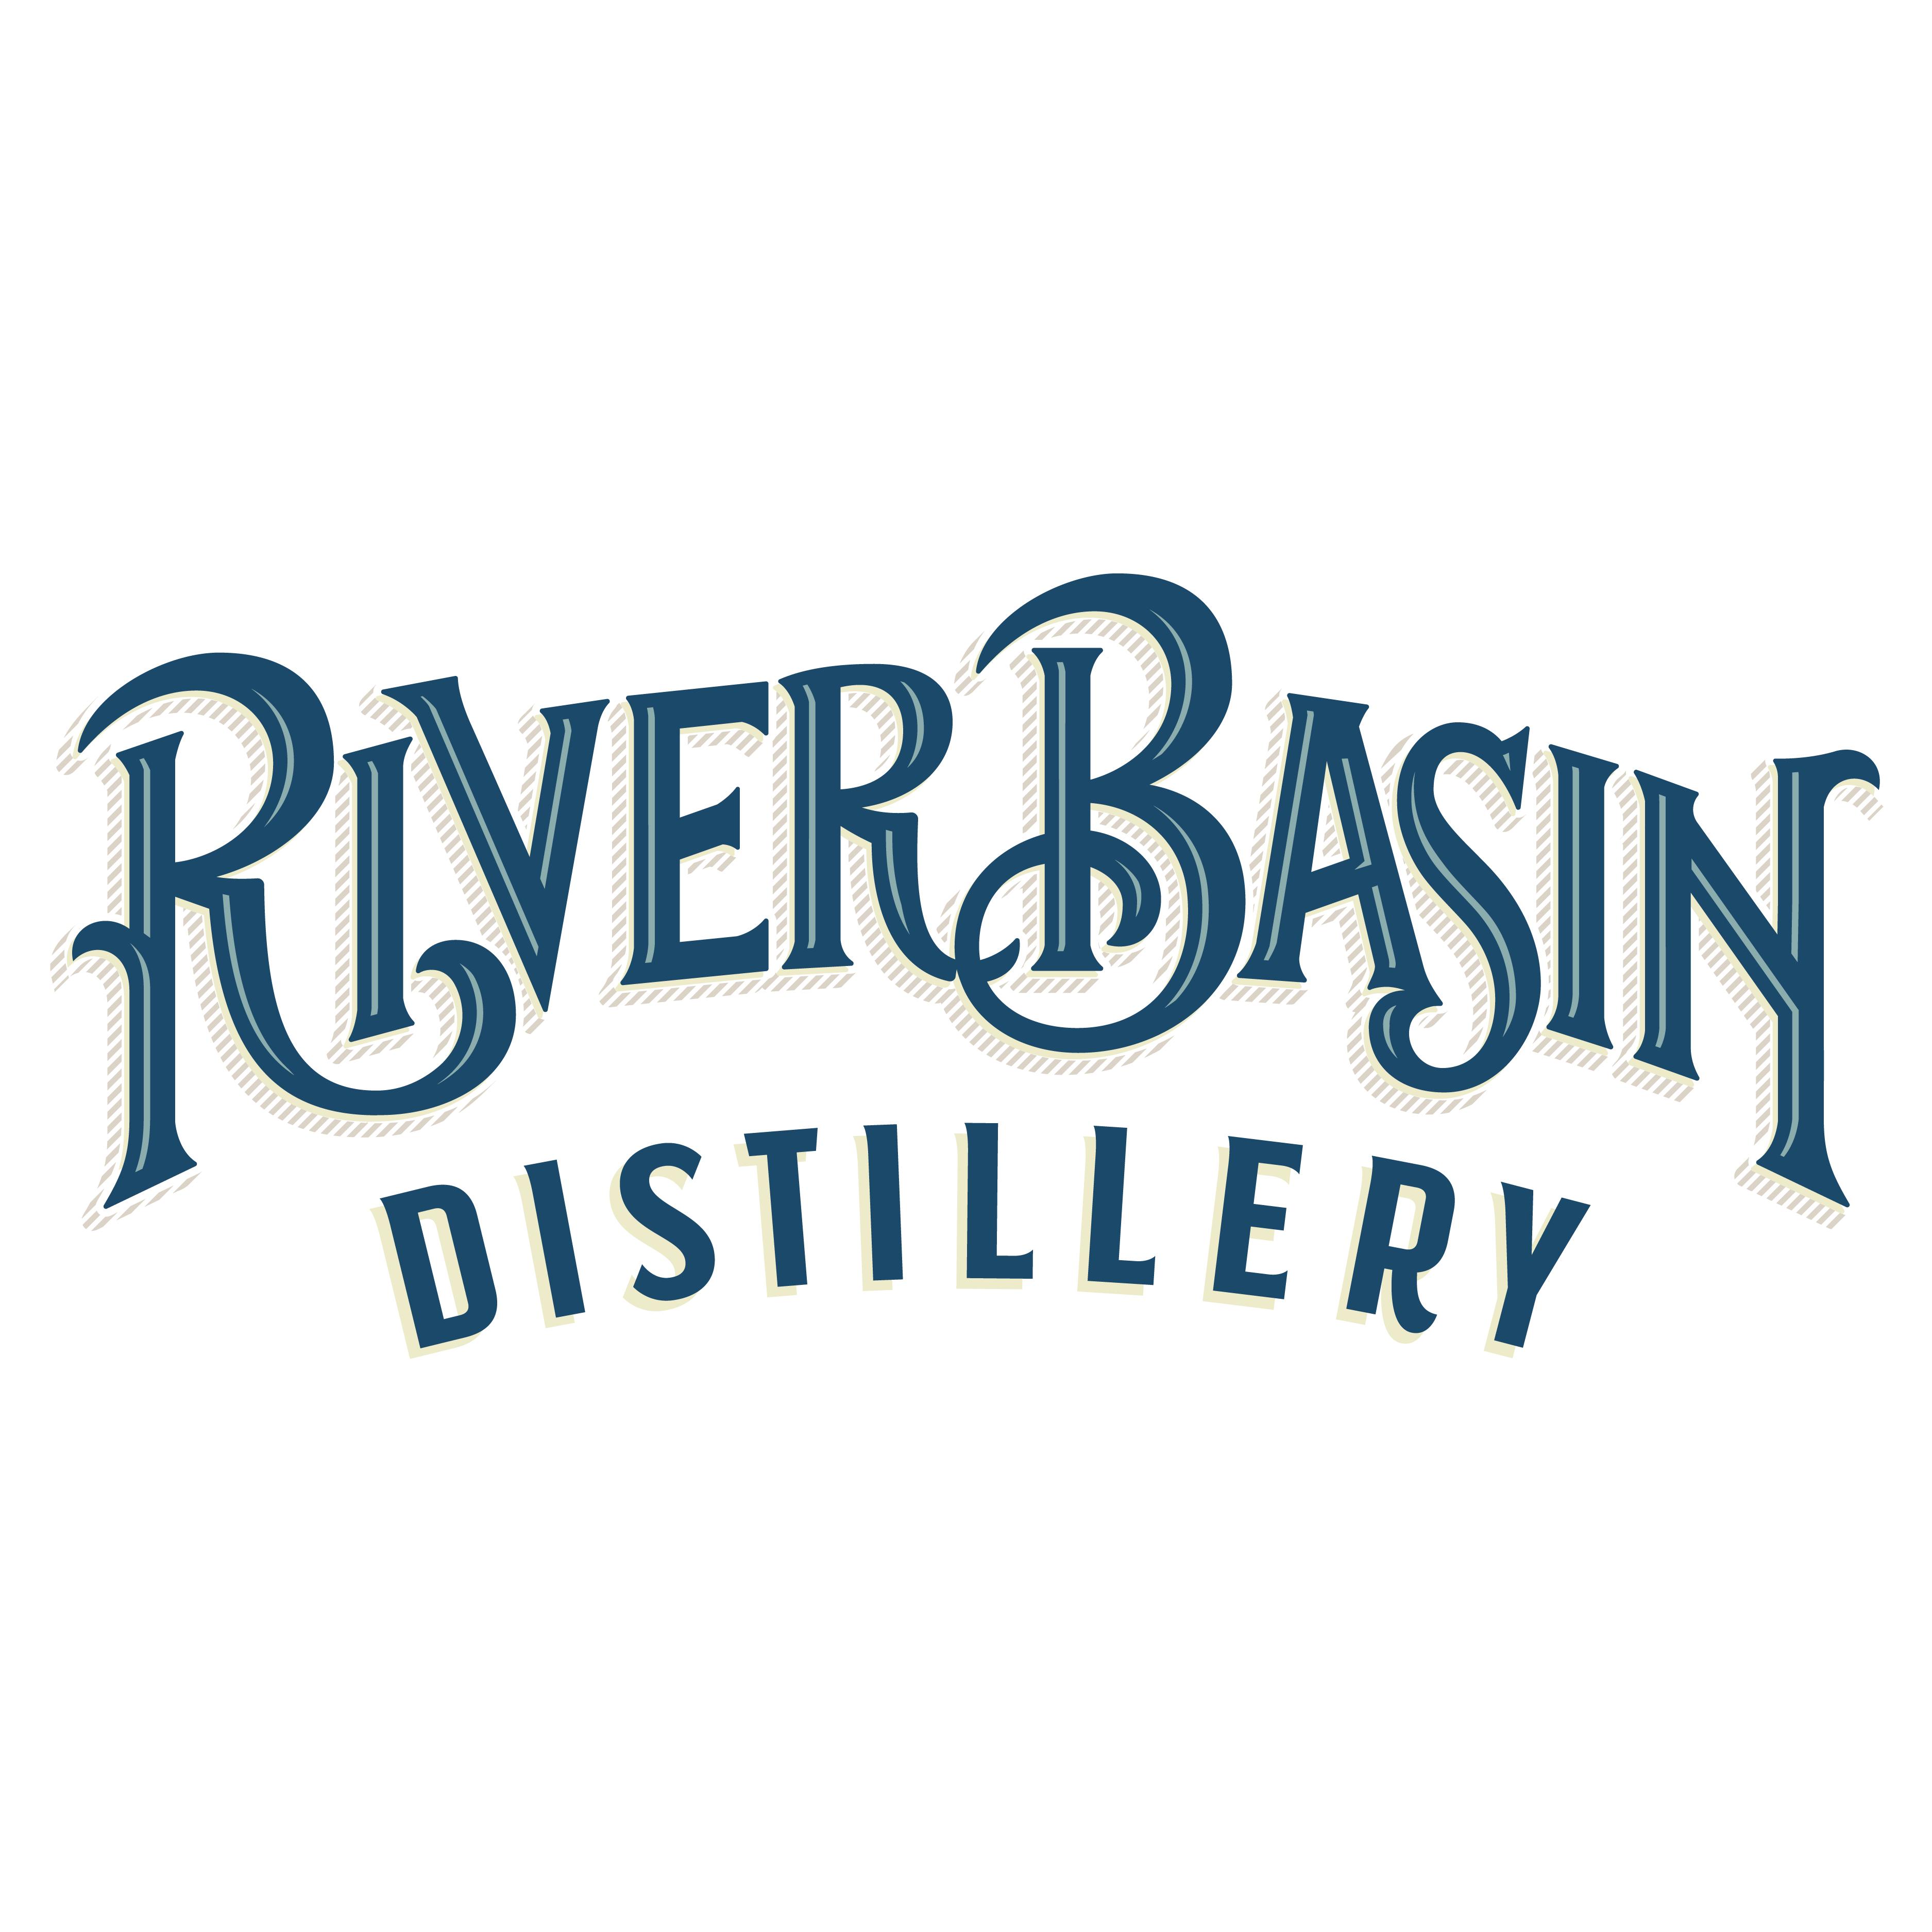 River Basin Distillery logo design by logo designer T.Barnes Graphics